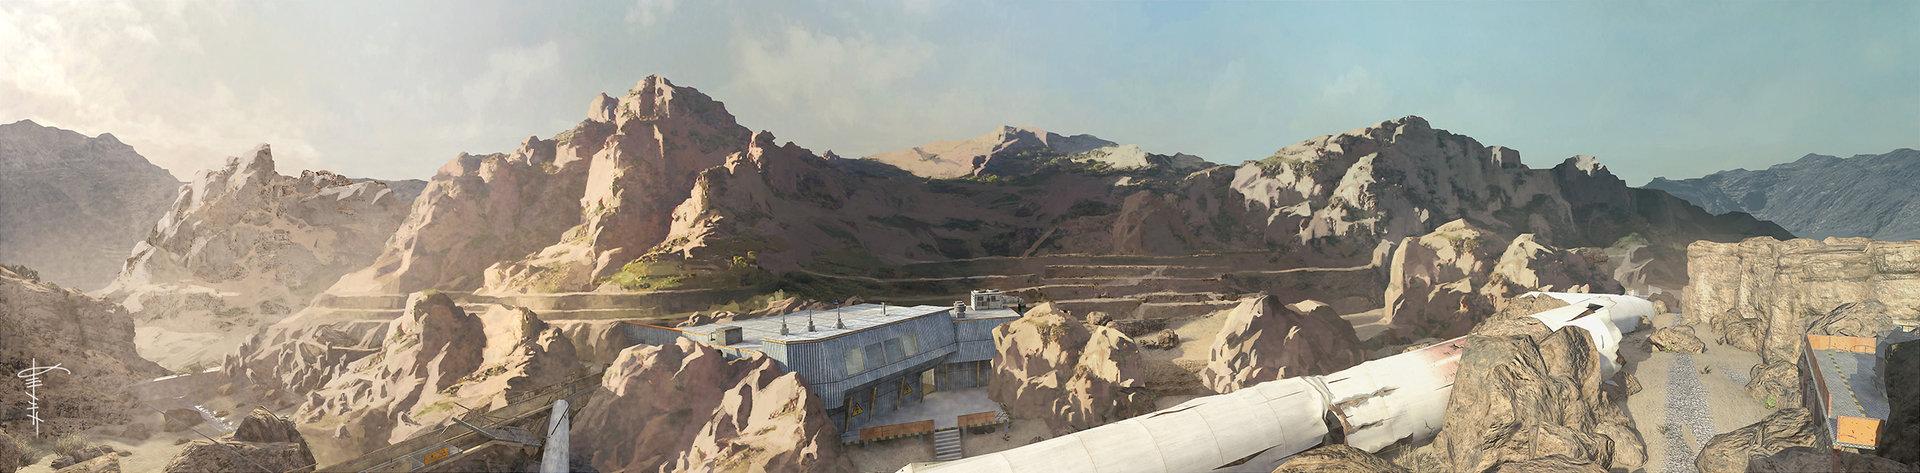 Kevin Baik - Call of Duty Concept Art